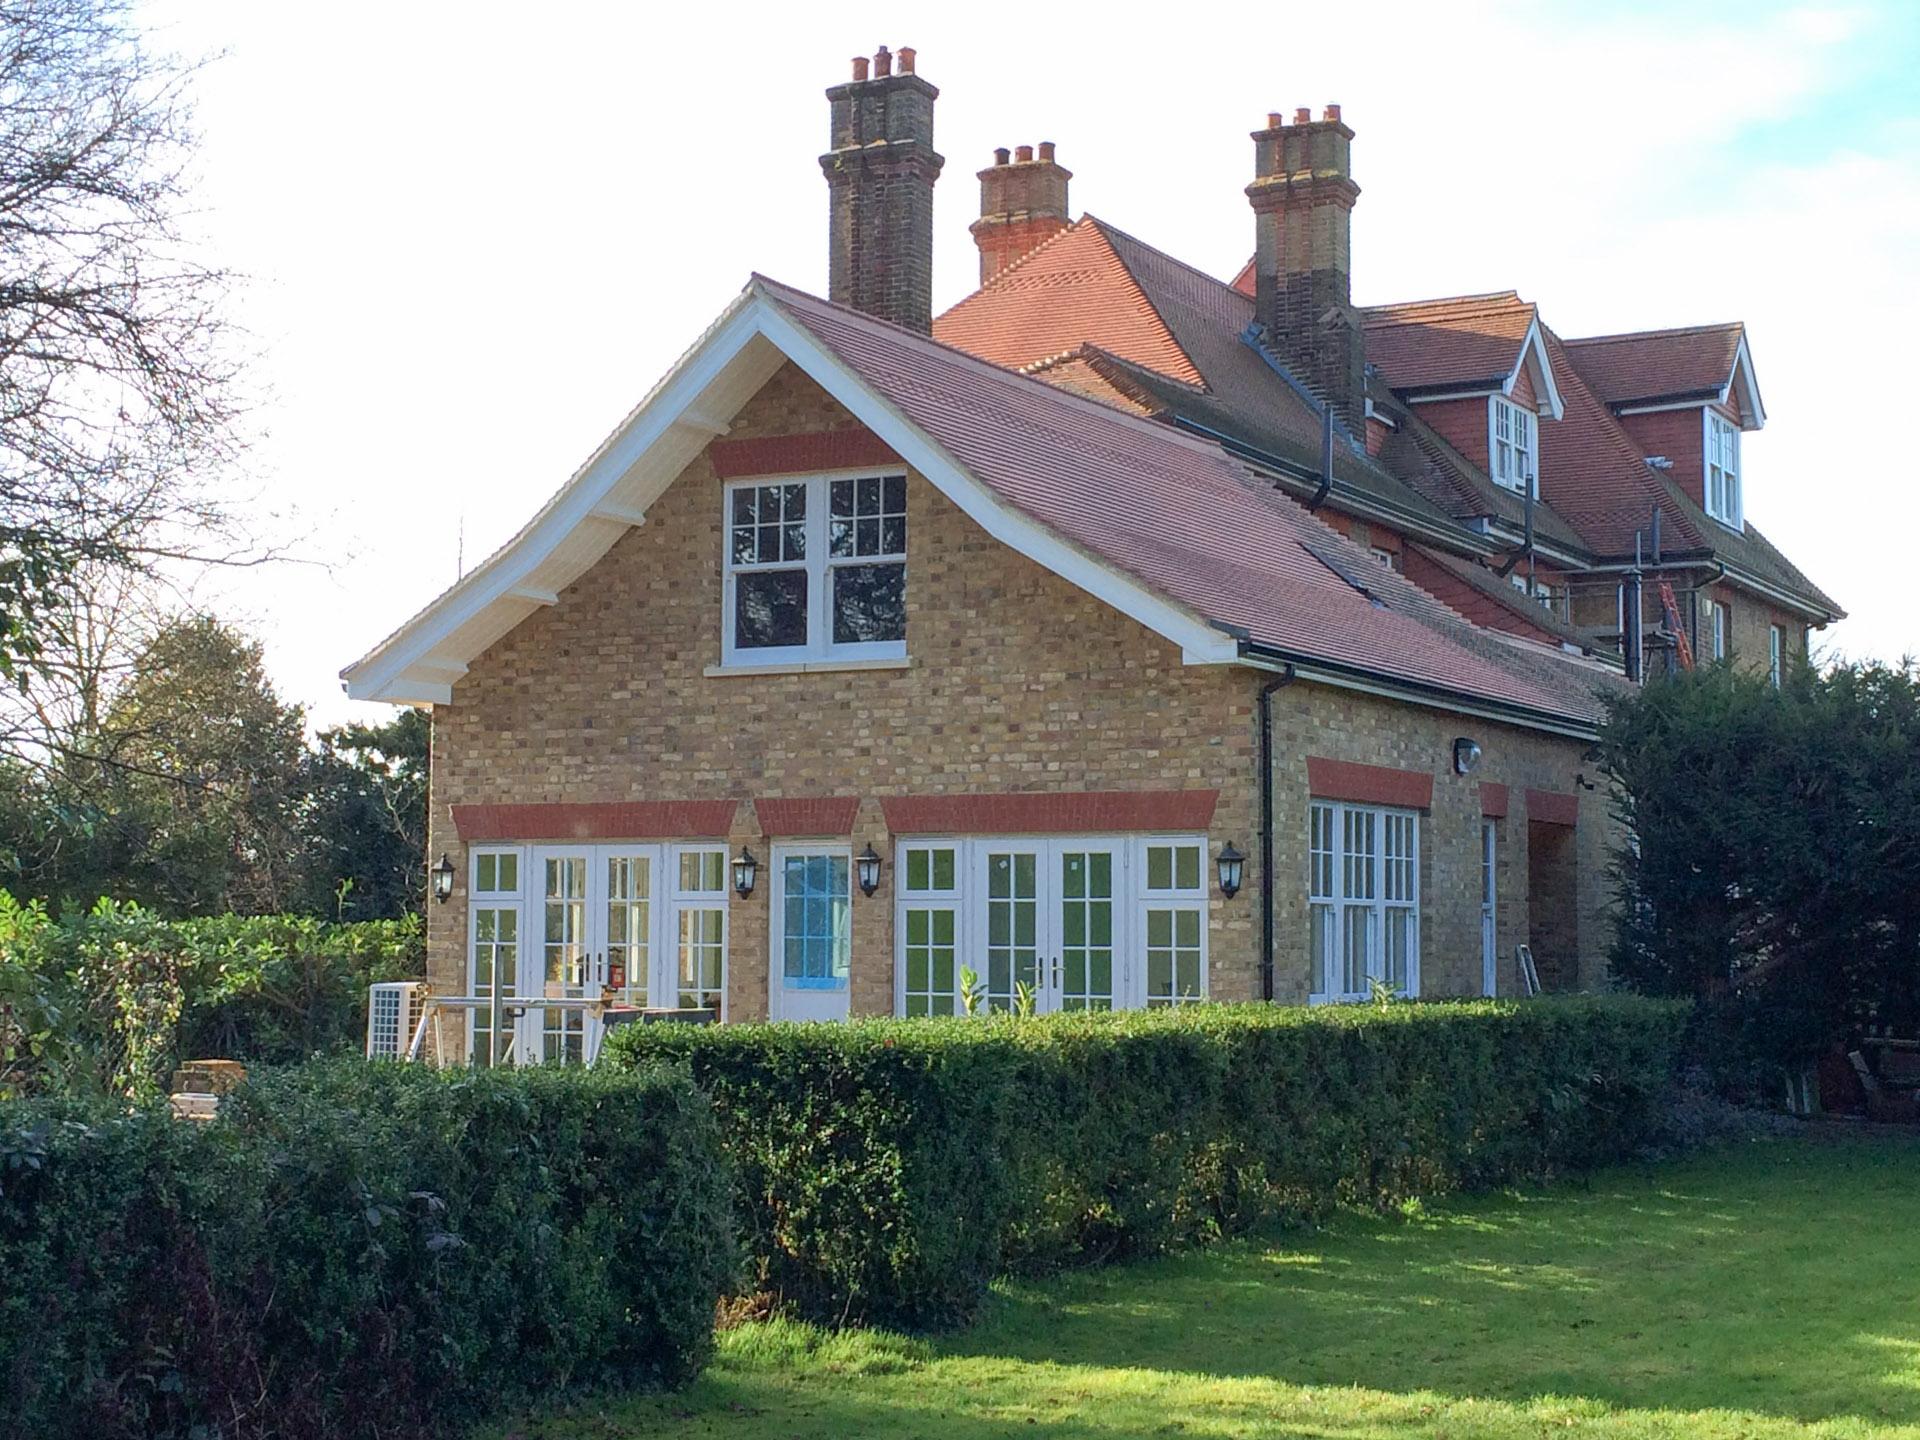 Home extension builders in Sevenoaks - Joseph PCL